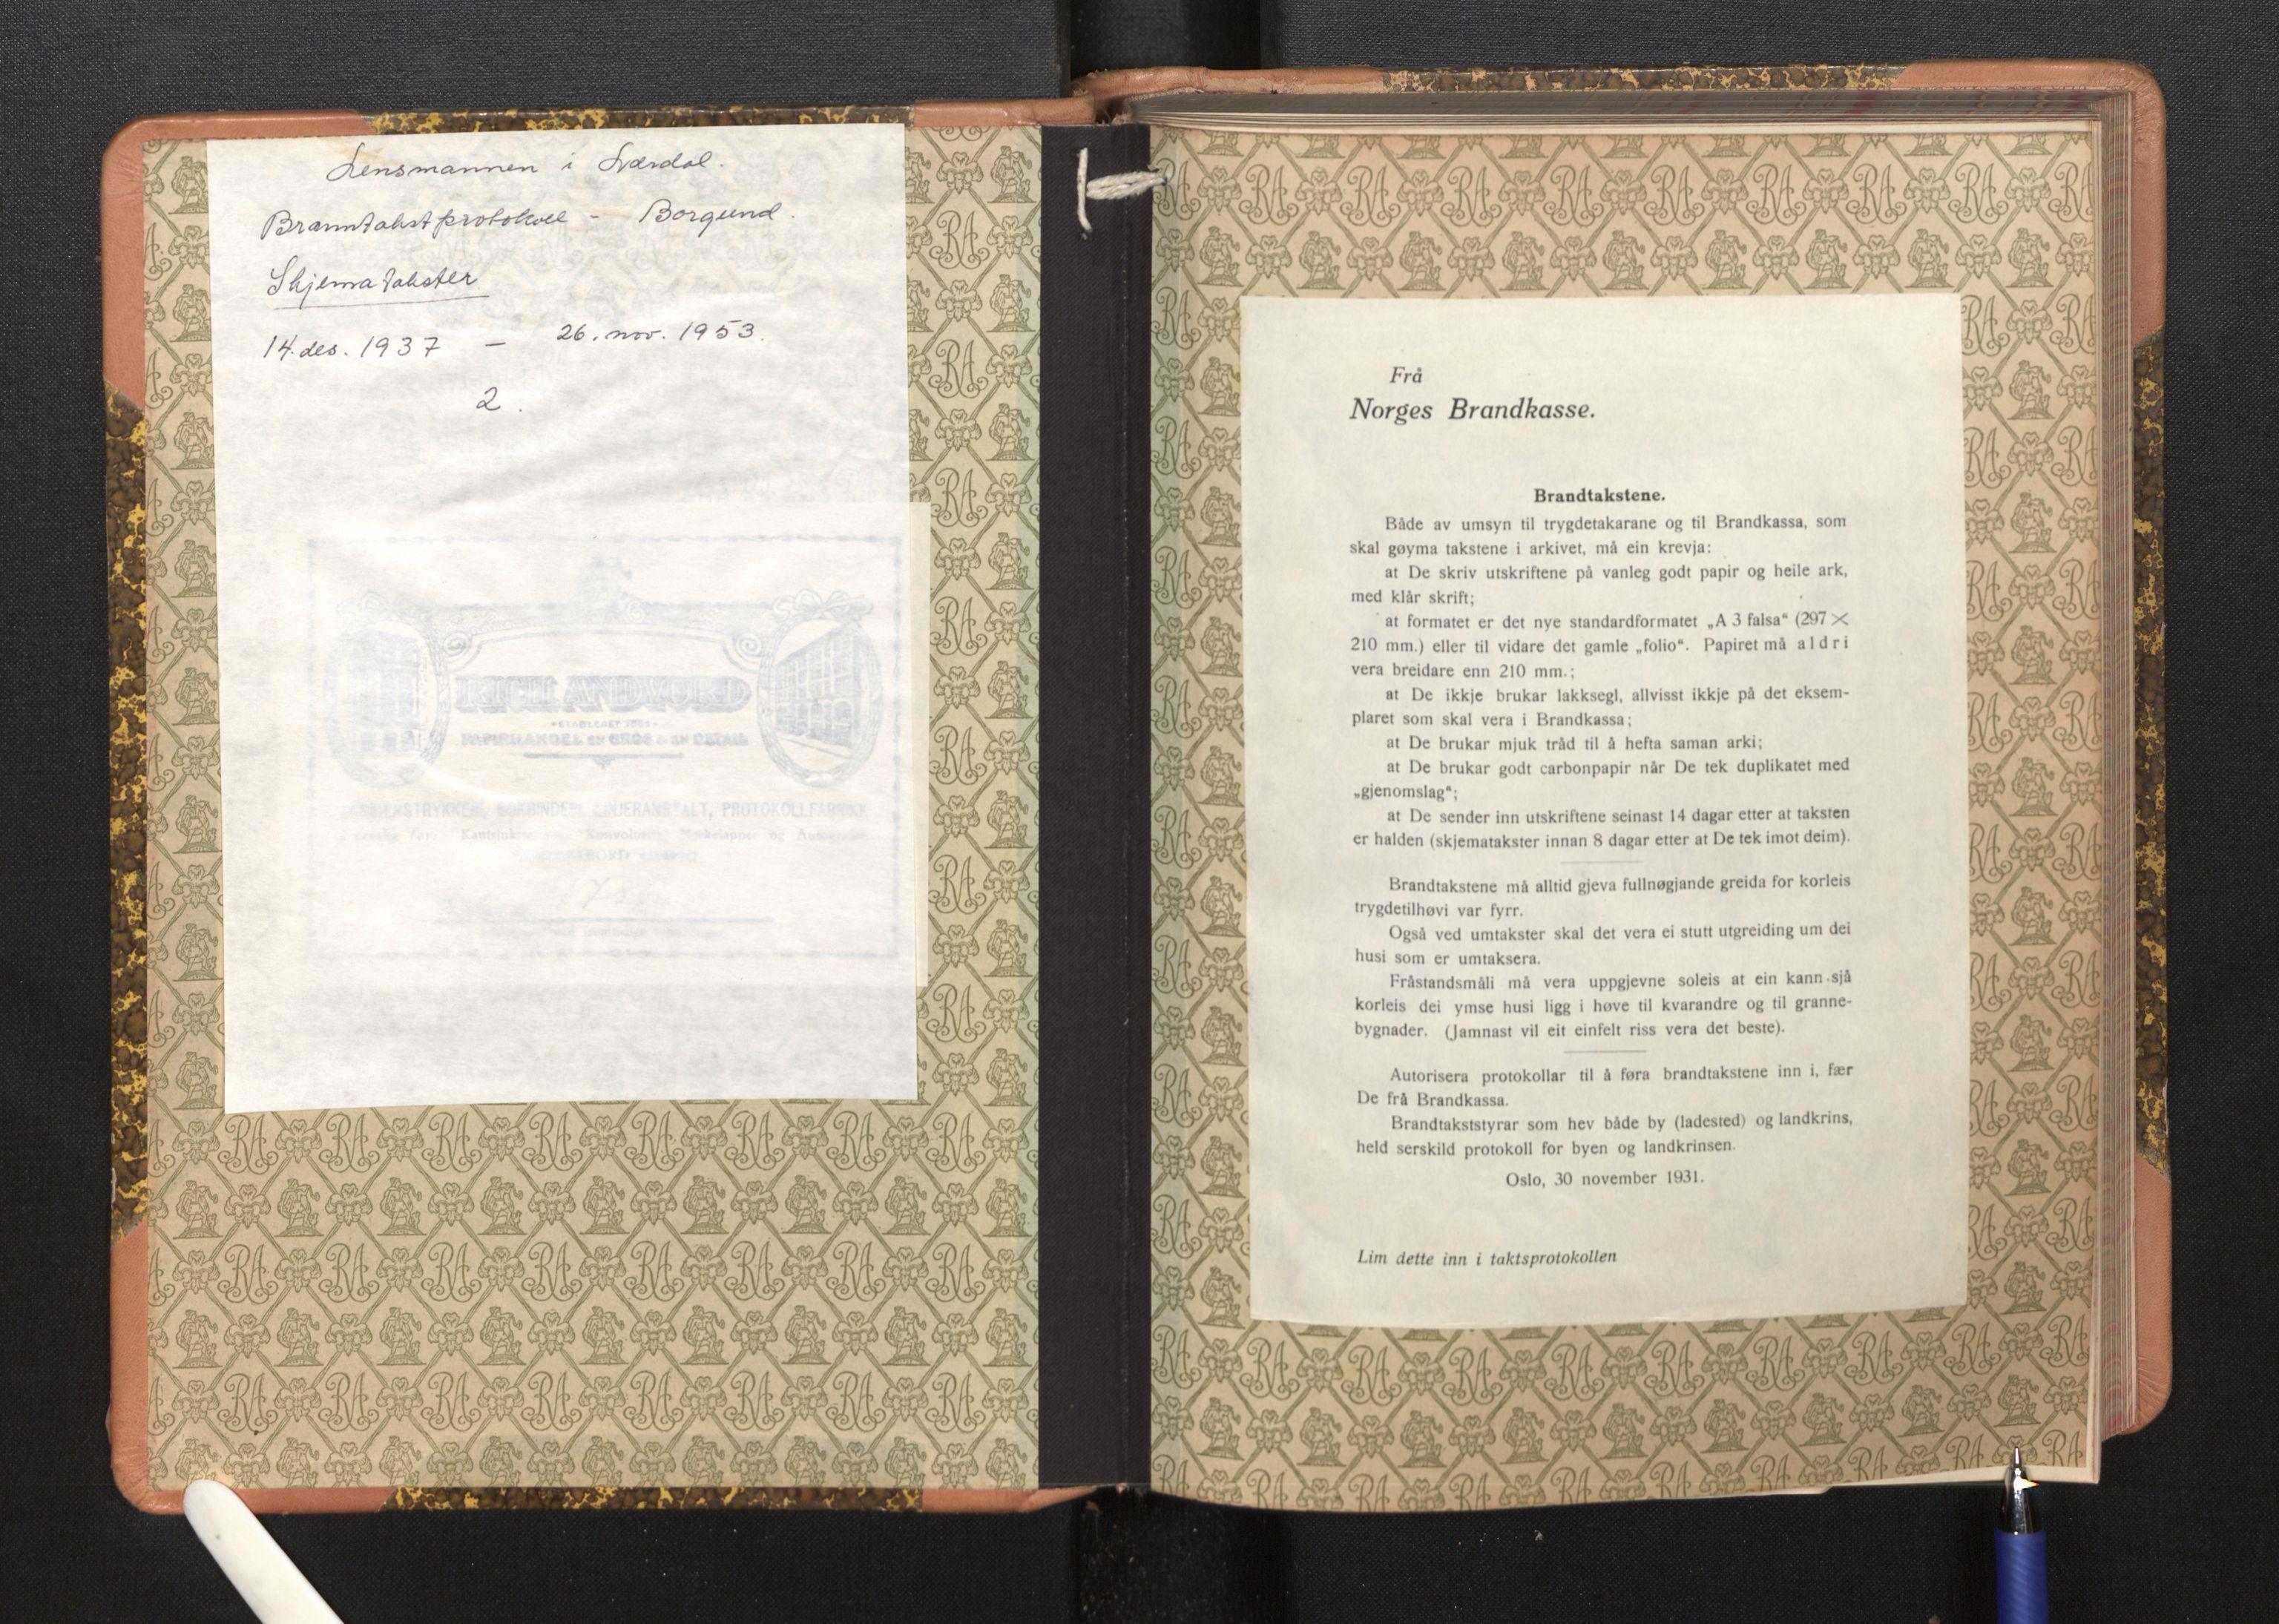 SAB, Lensmannen i Borgund, 0012/L0004: Branntakstprotokoll, skjematakst, 1937-1953